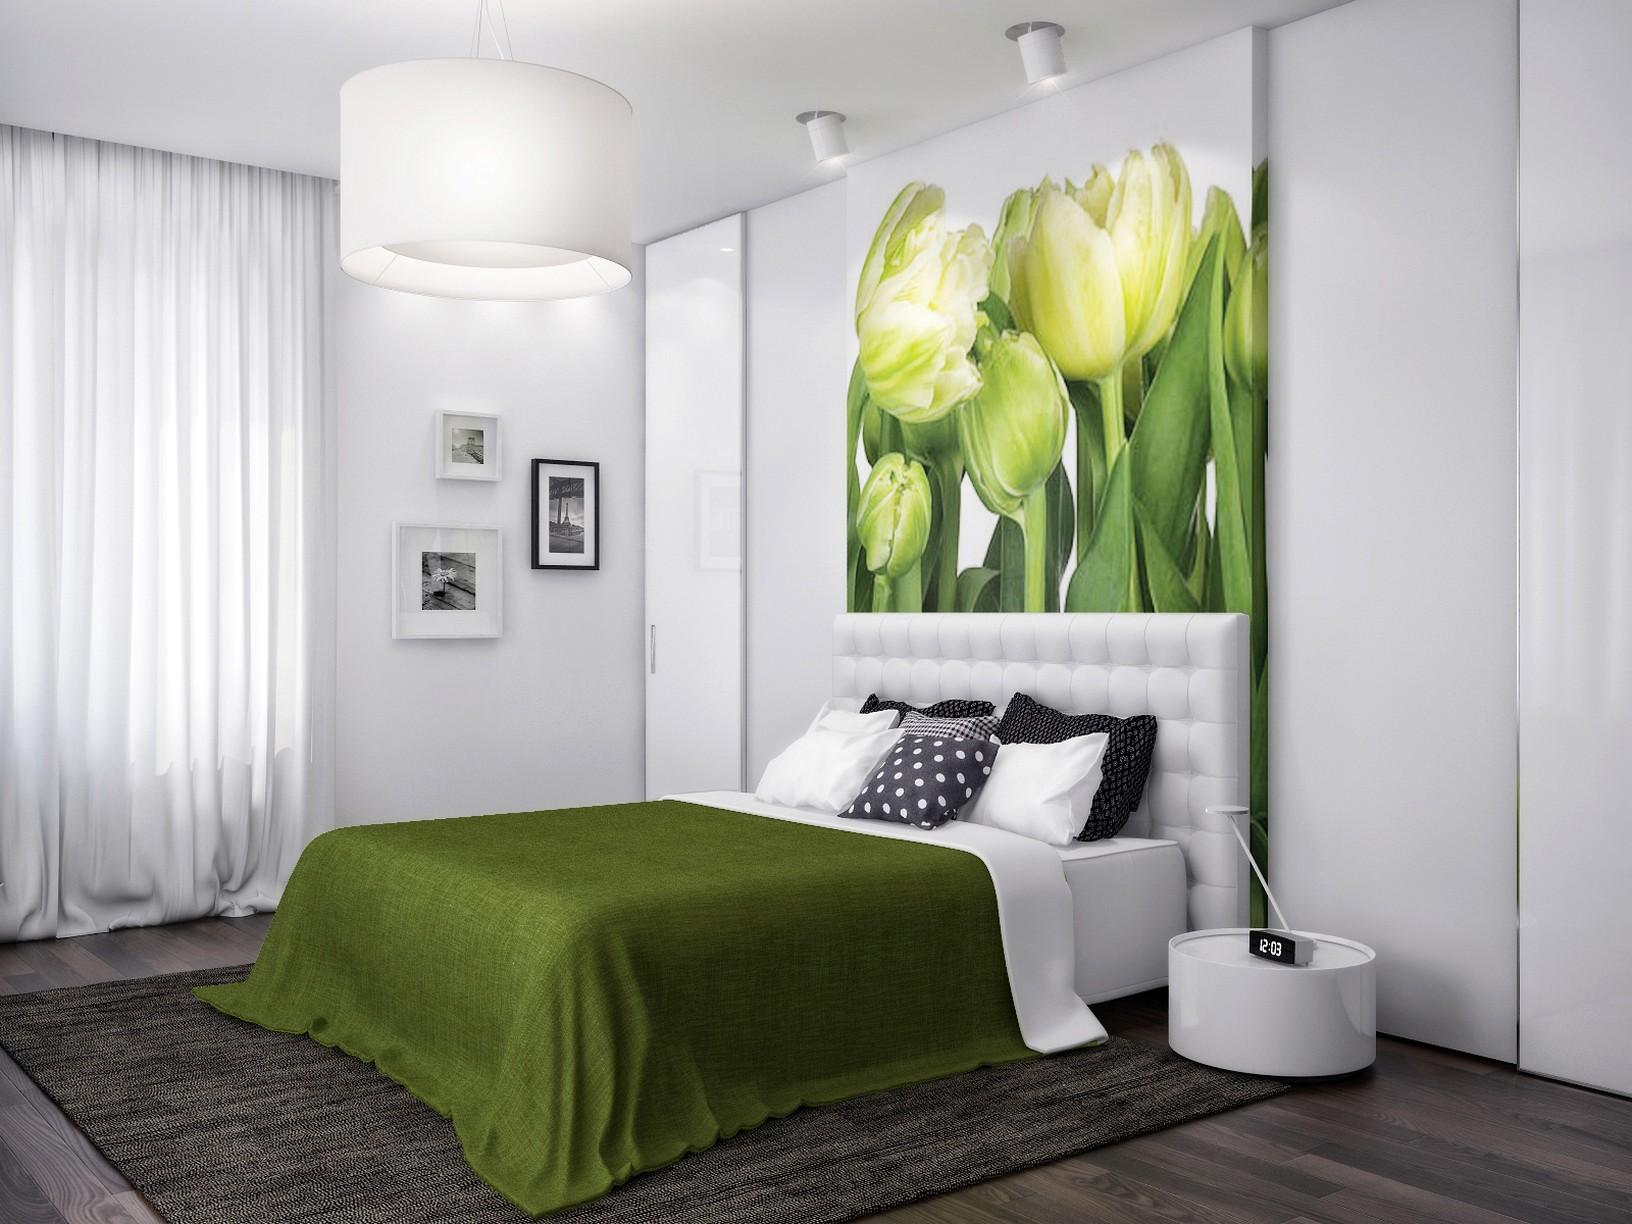 Спальня в бело зеленом цвете фото